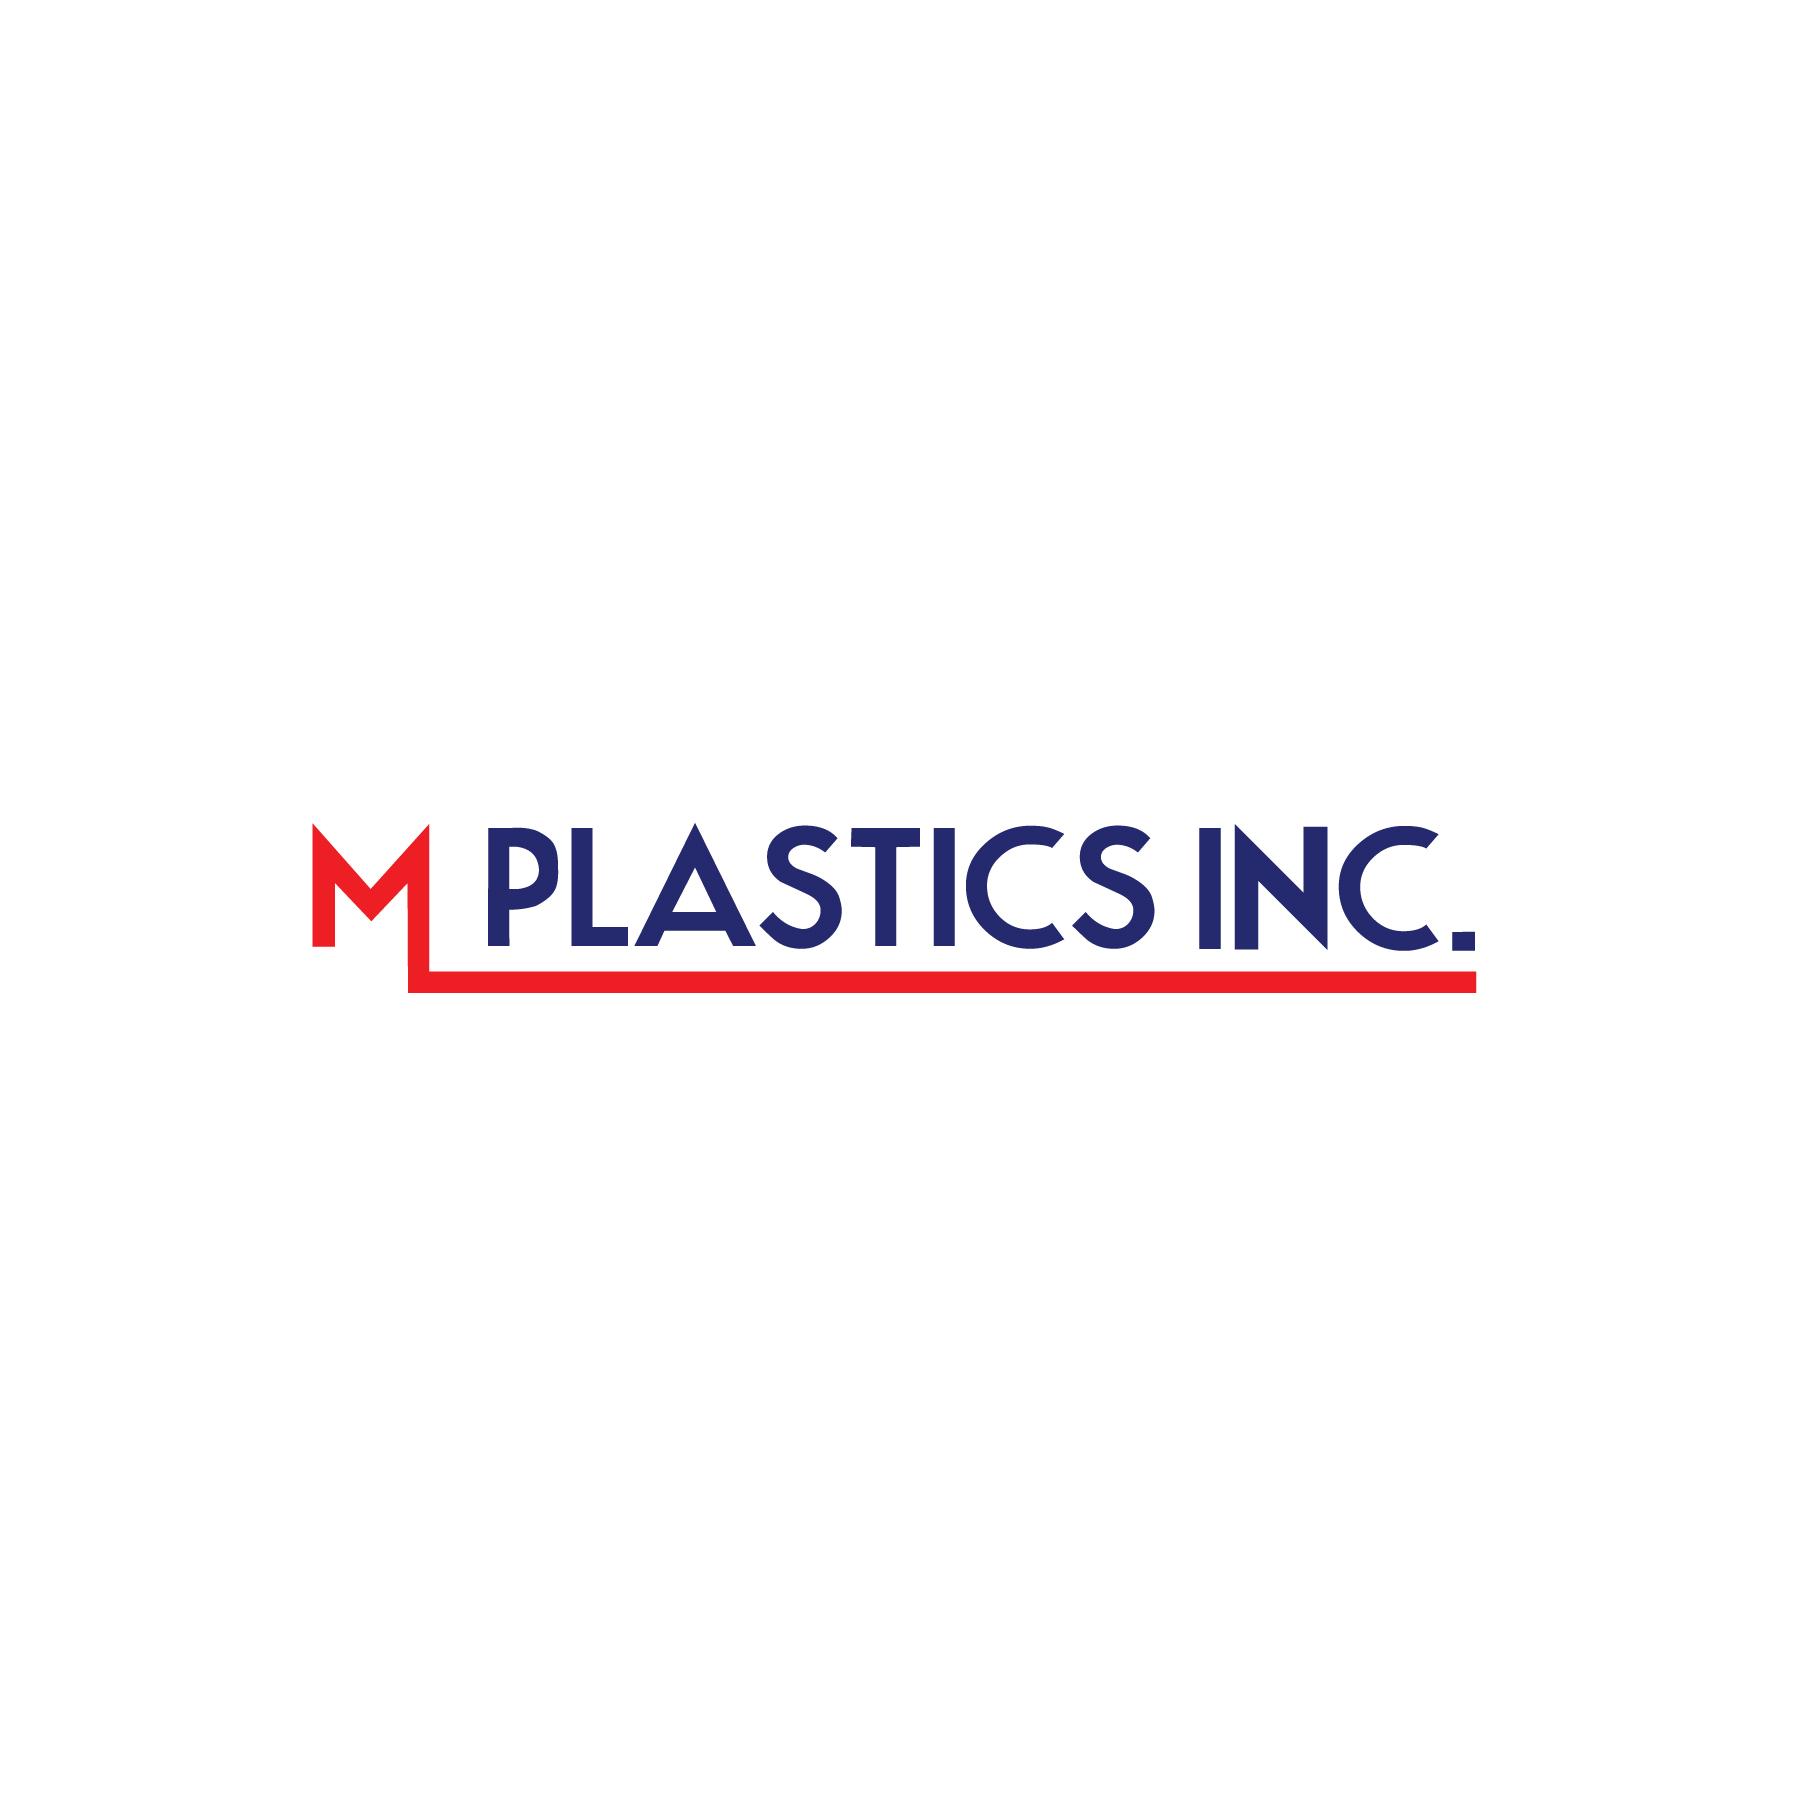 M Plastics Inc.